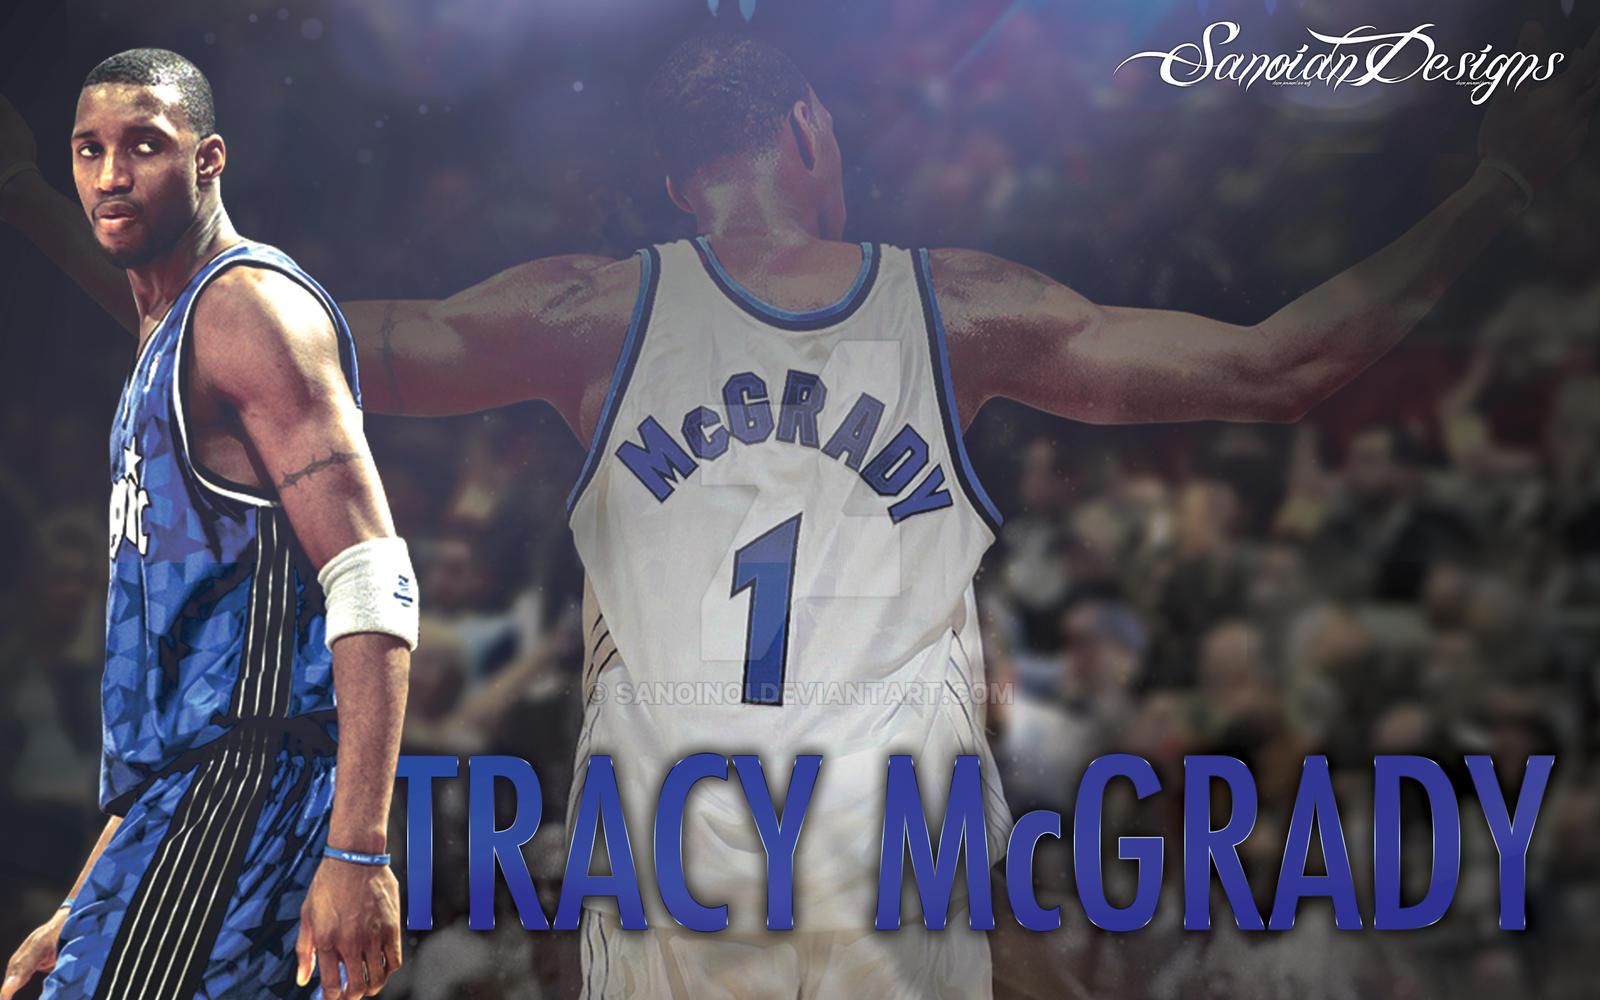 Tracy McGrady by Sanoinoi on DeviantArt